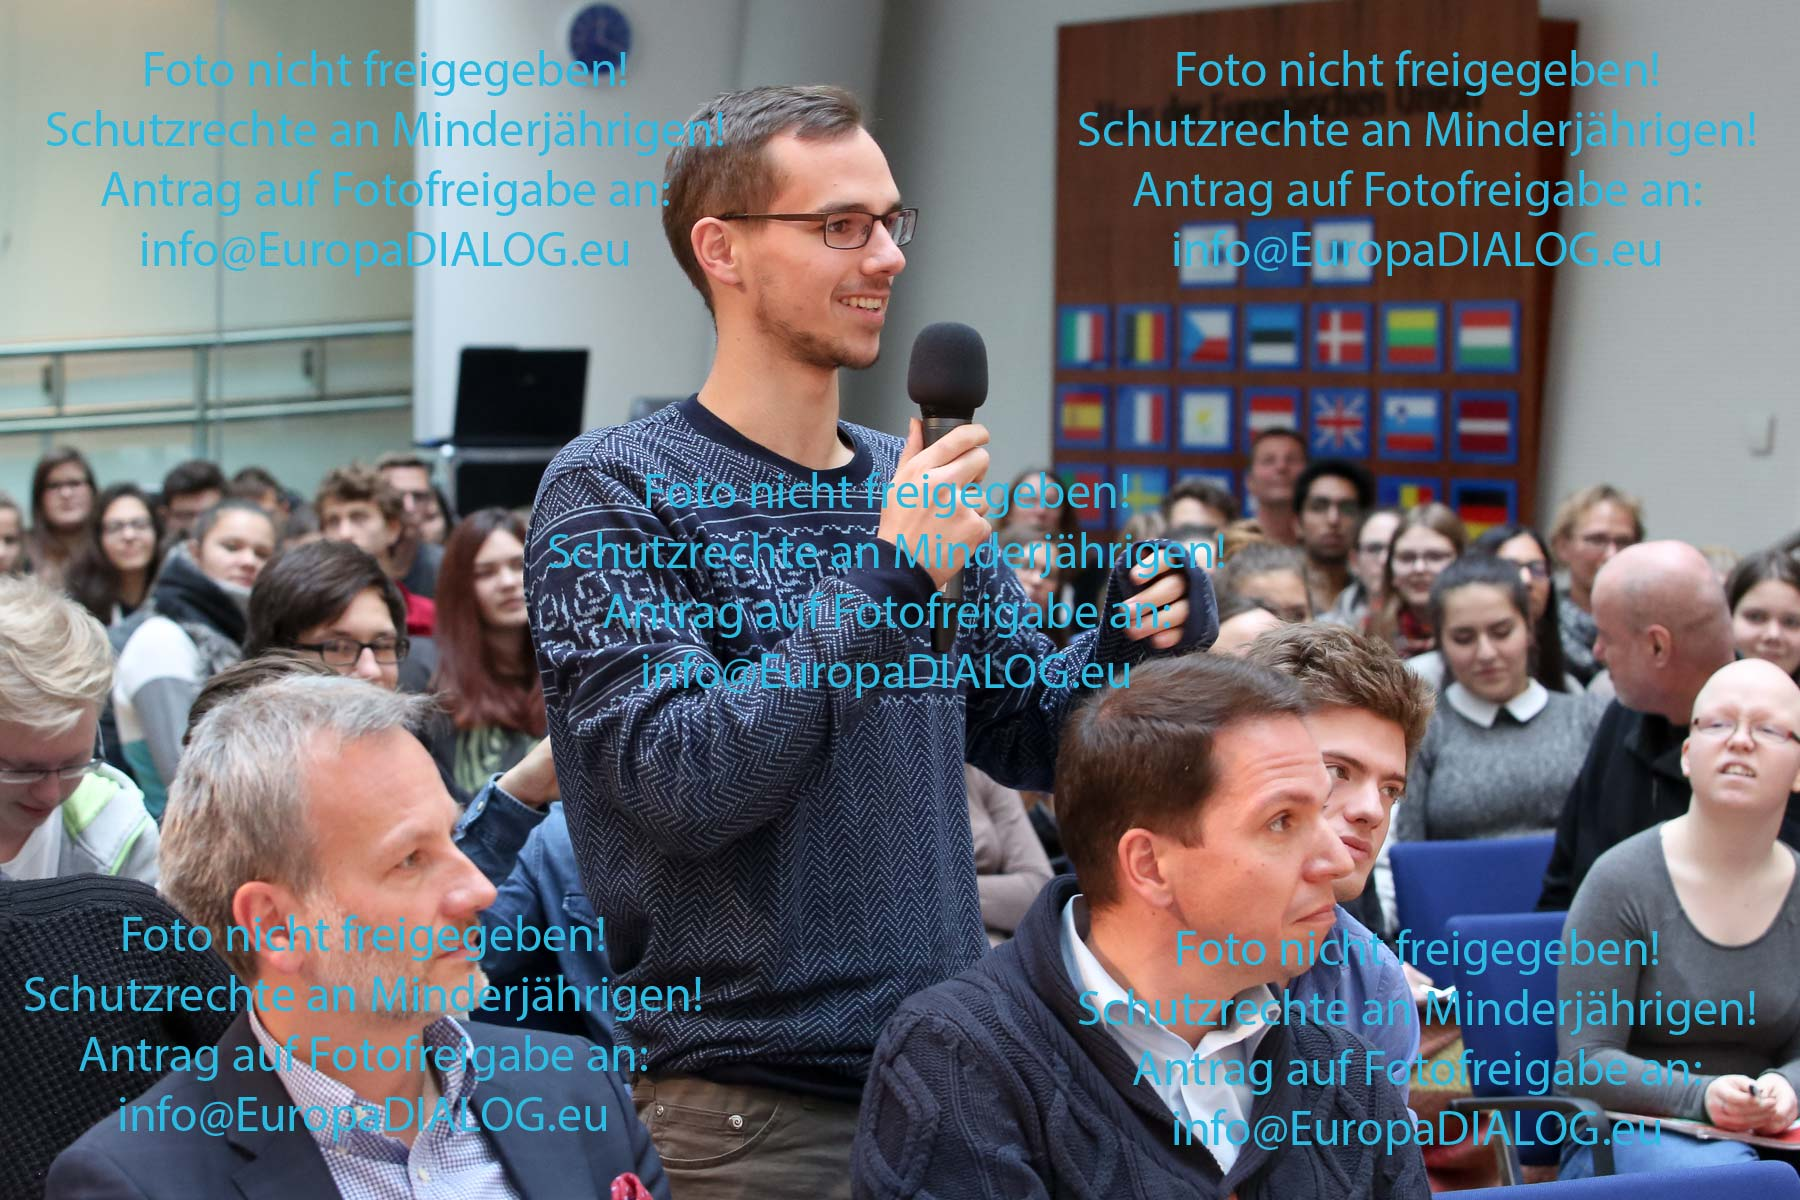 europadialog_bettina-prendergast_s_b12__331744_-katharina-schiffl__